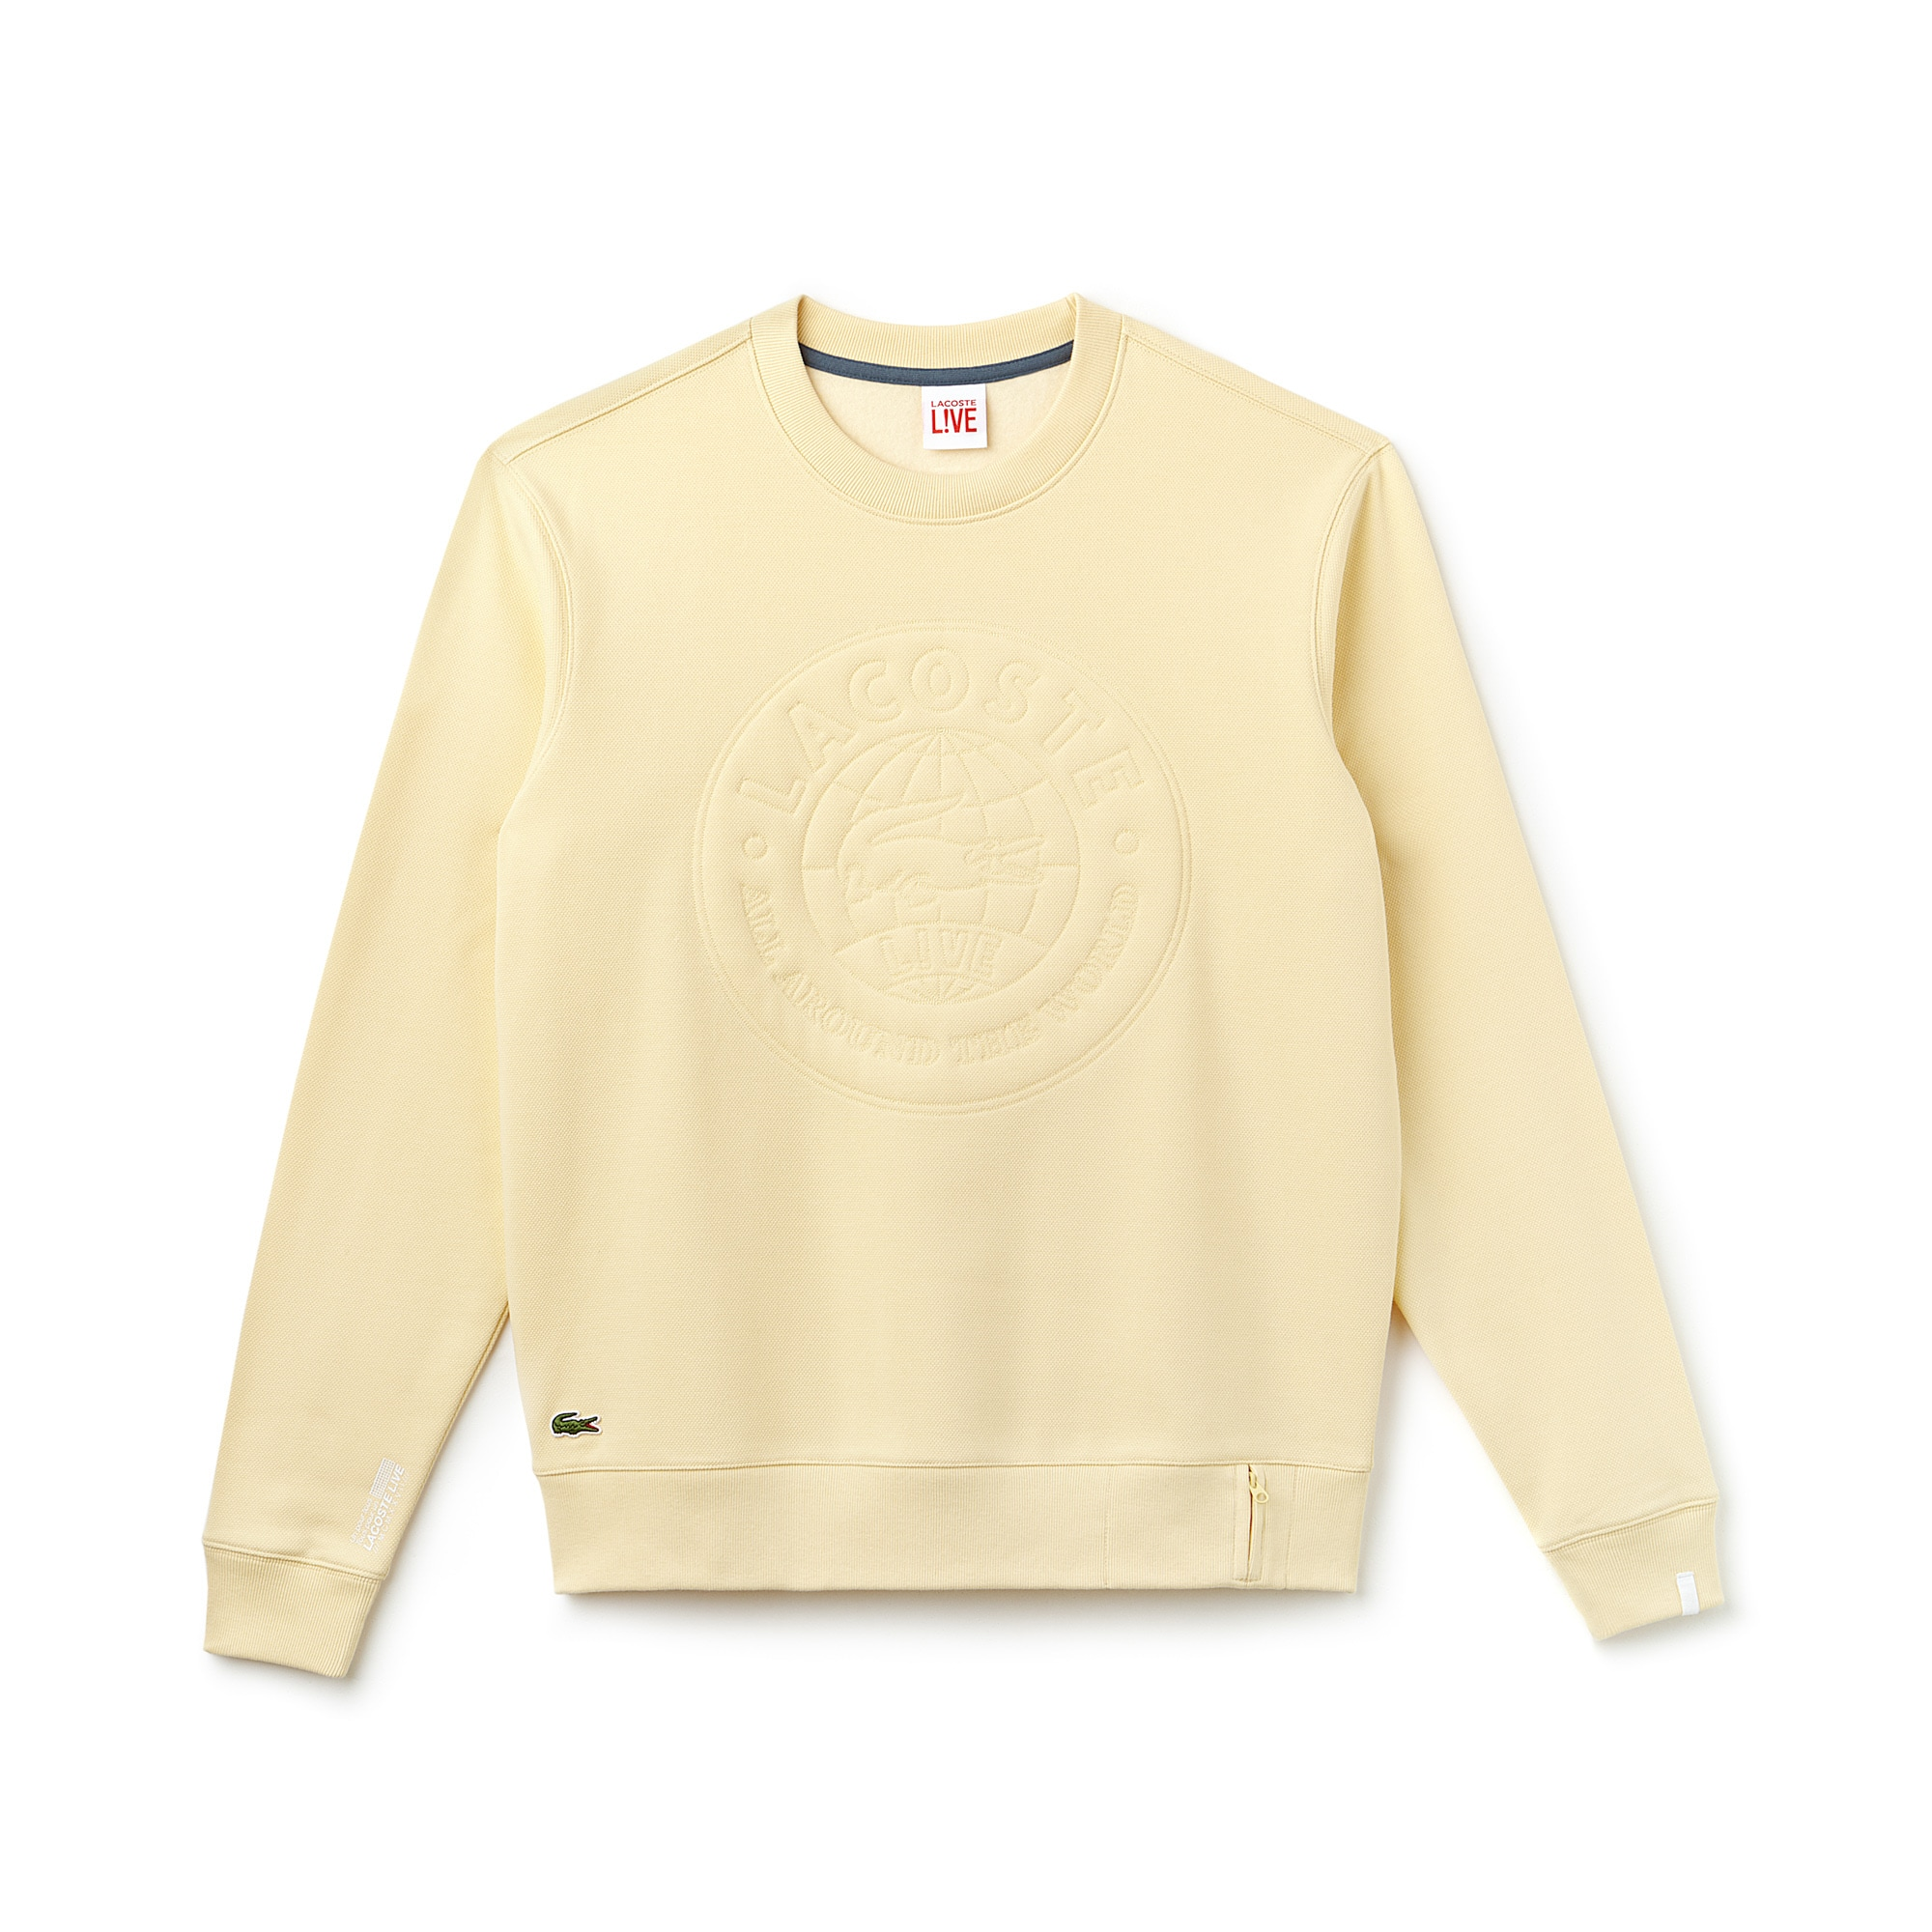 Unisex LIVE Logo Design Sweatshirt